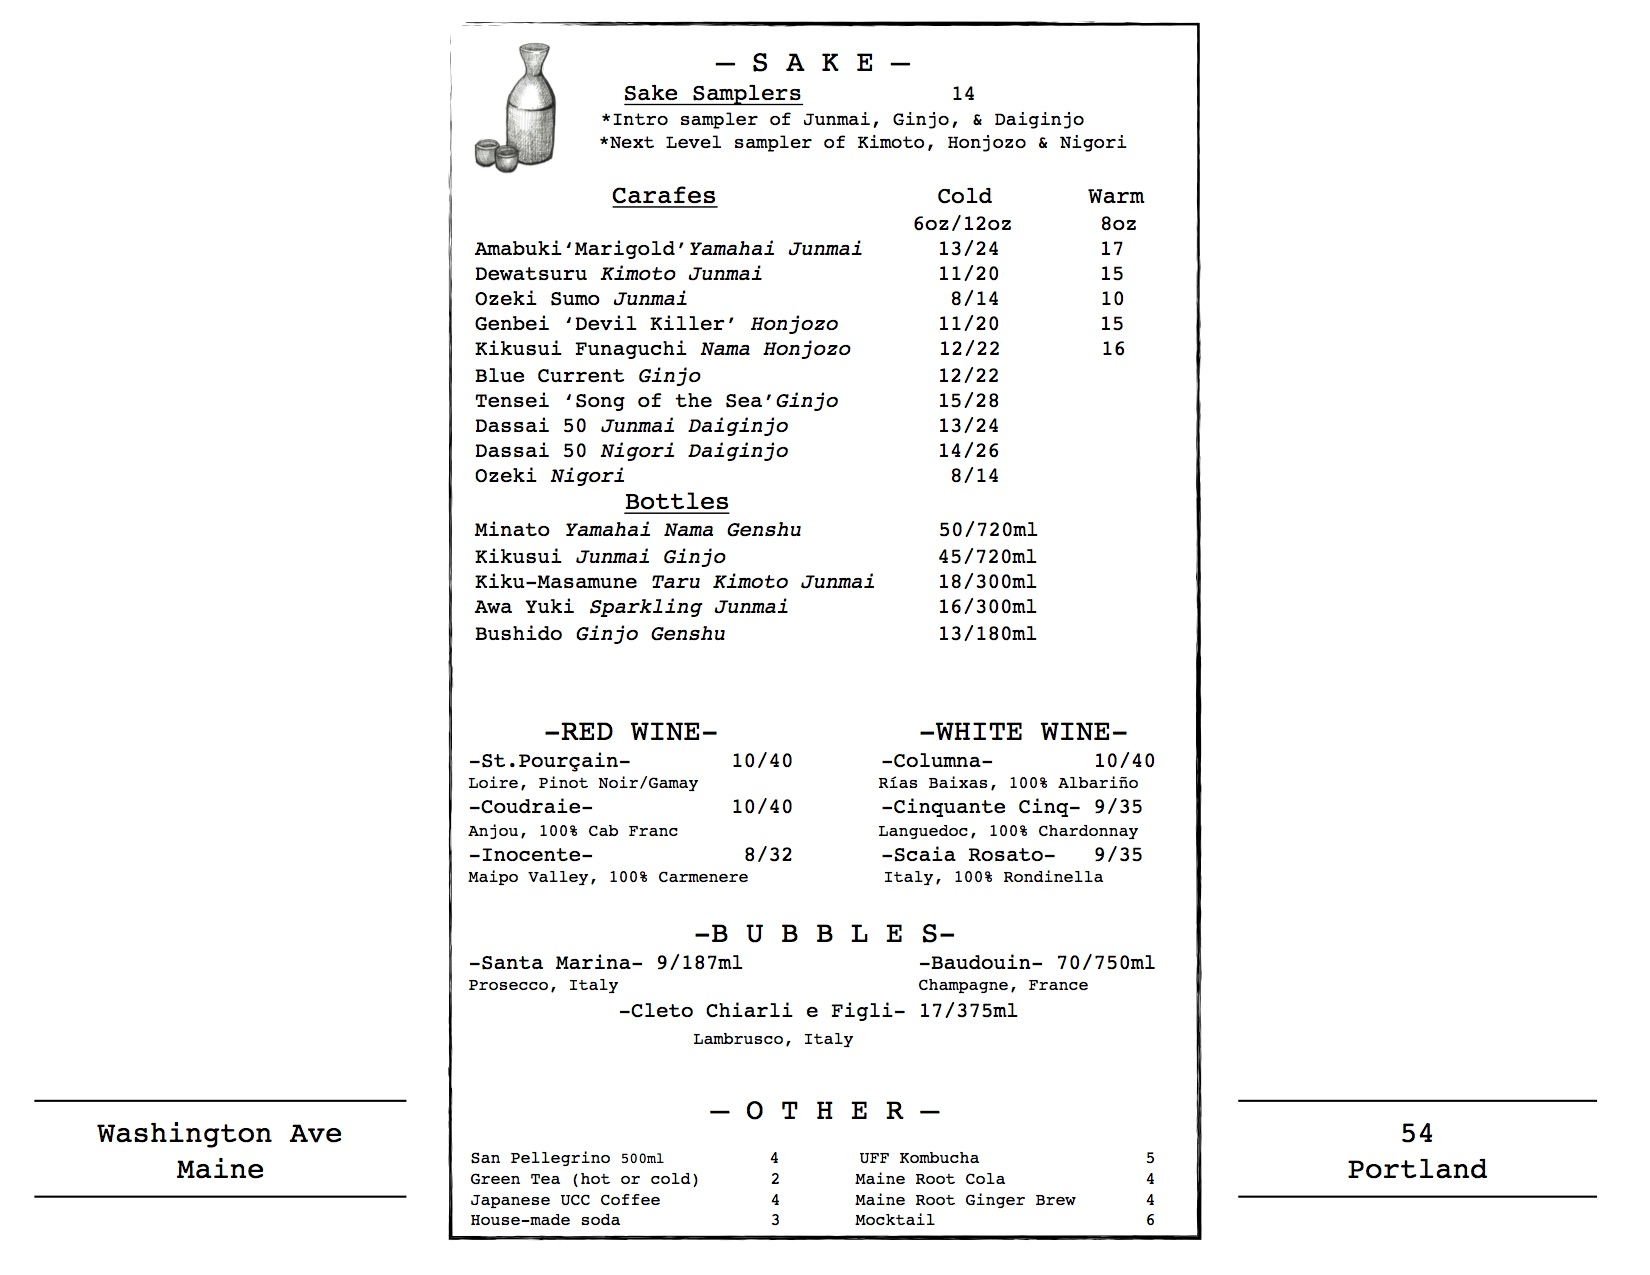 Sake, Wine, Beer List-11:27